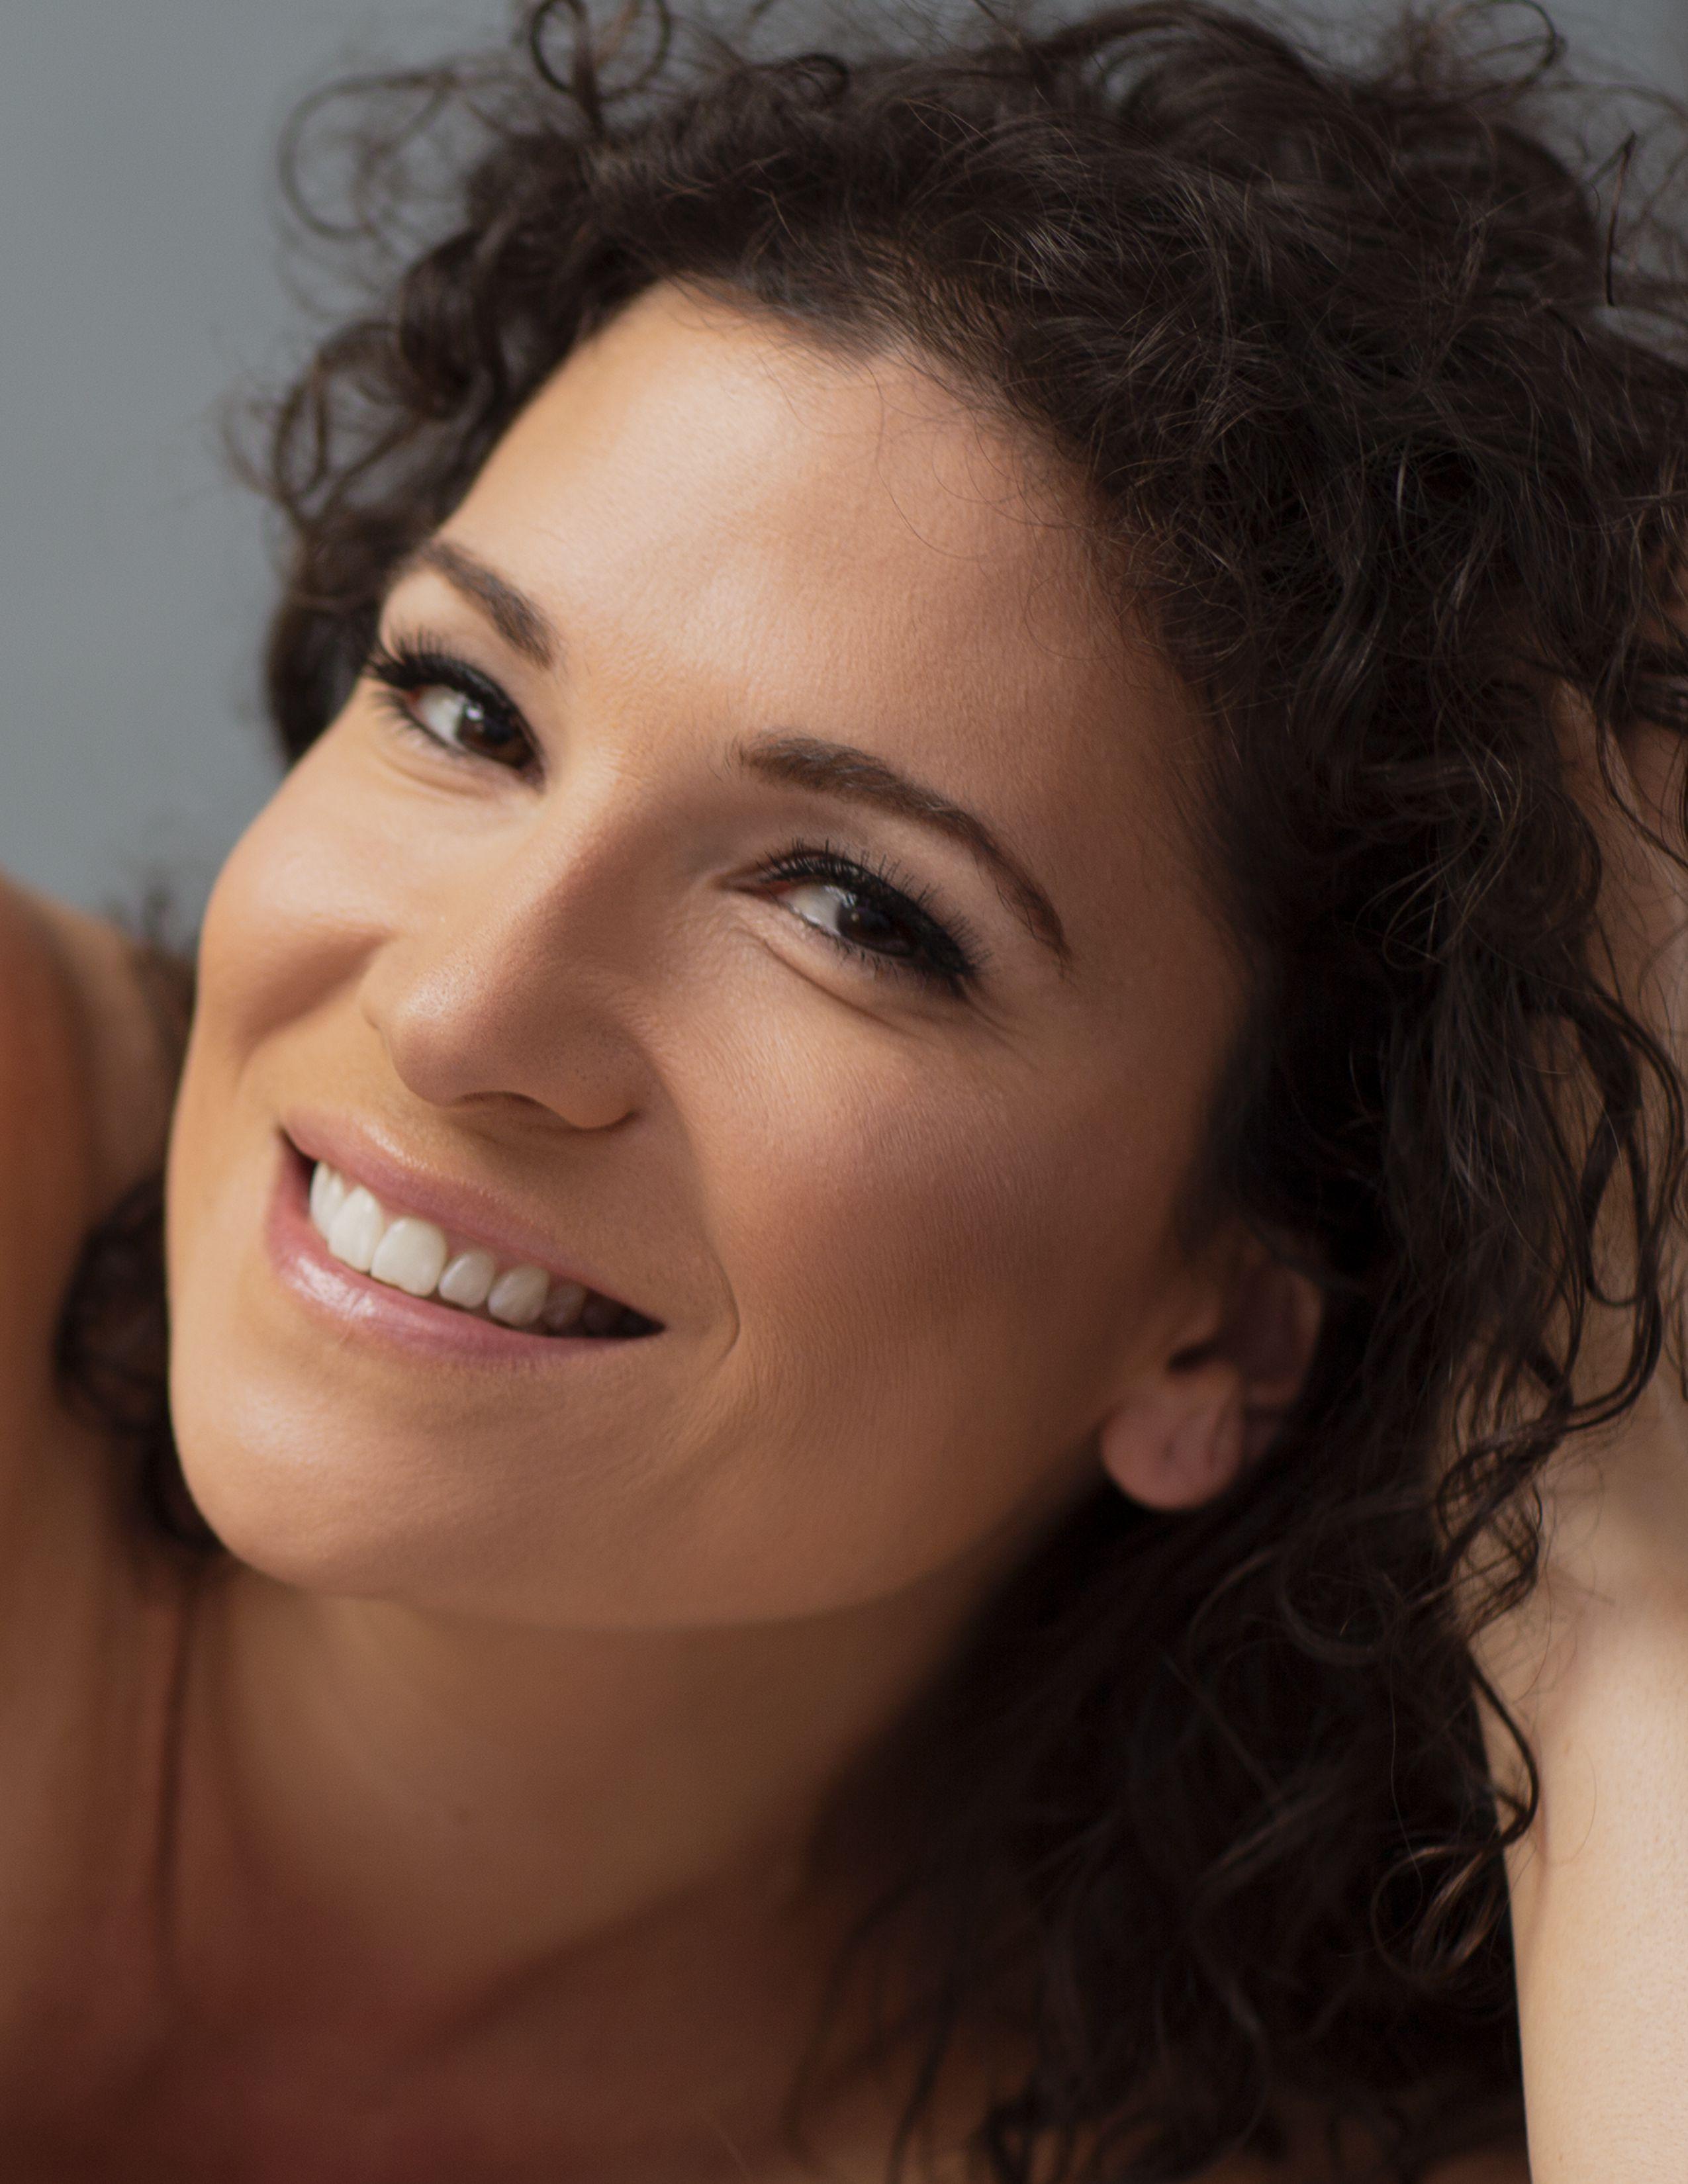 Danielle Pastin